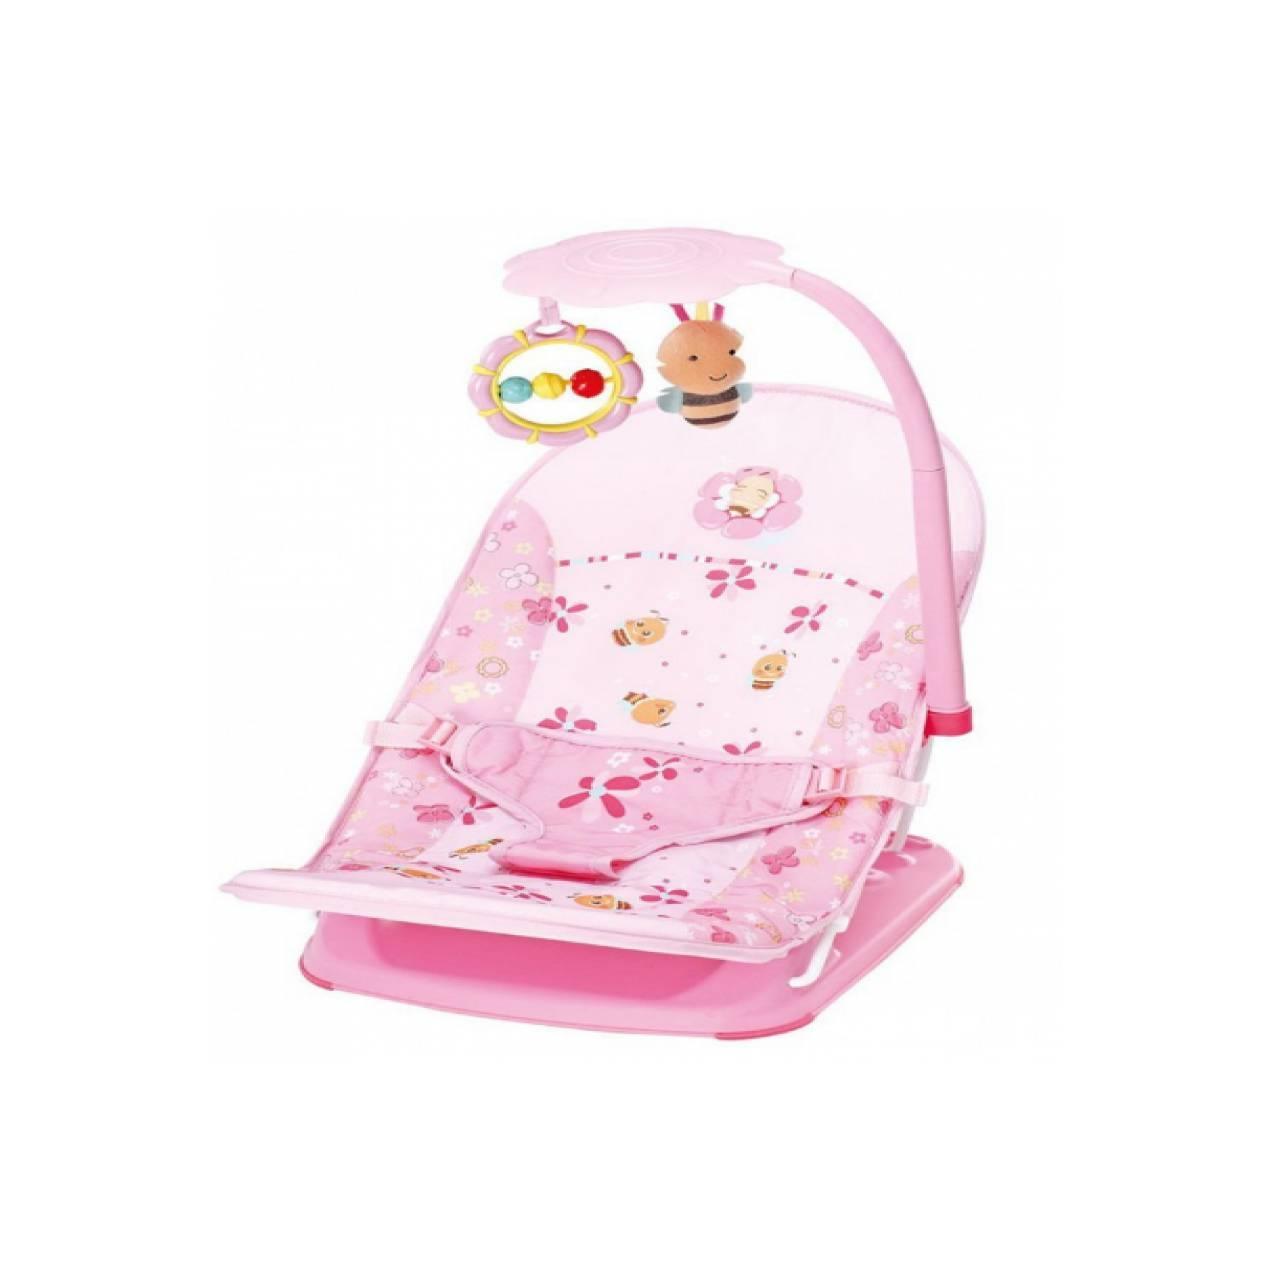 Mastela Fold Up Infant Seat+Toys Pink /Bouncer / Kursi Santai Bayi(SC)